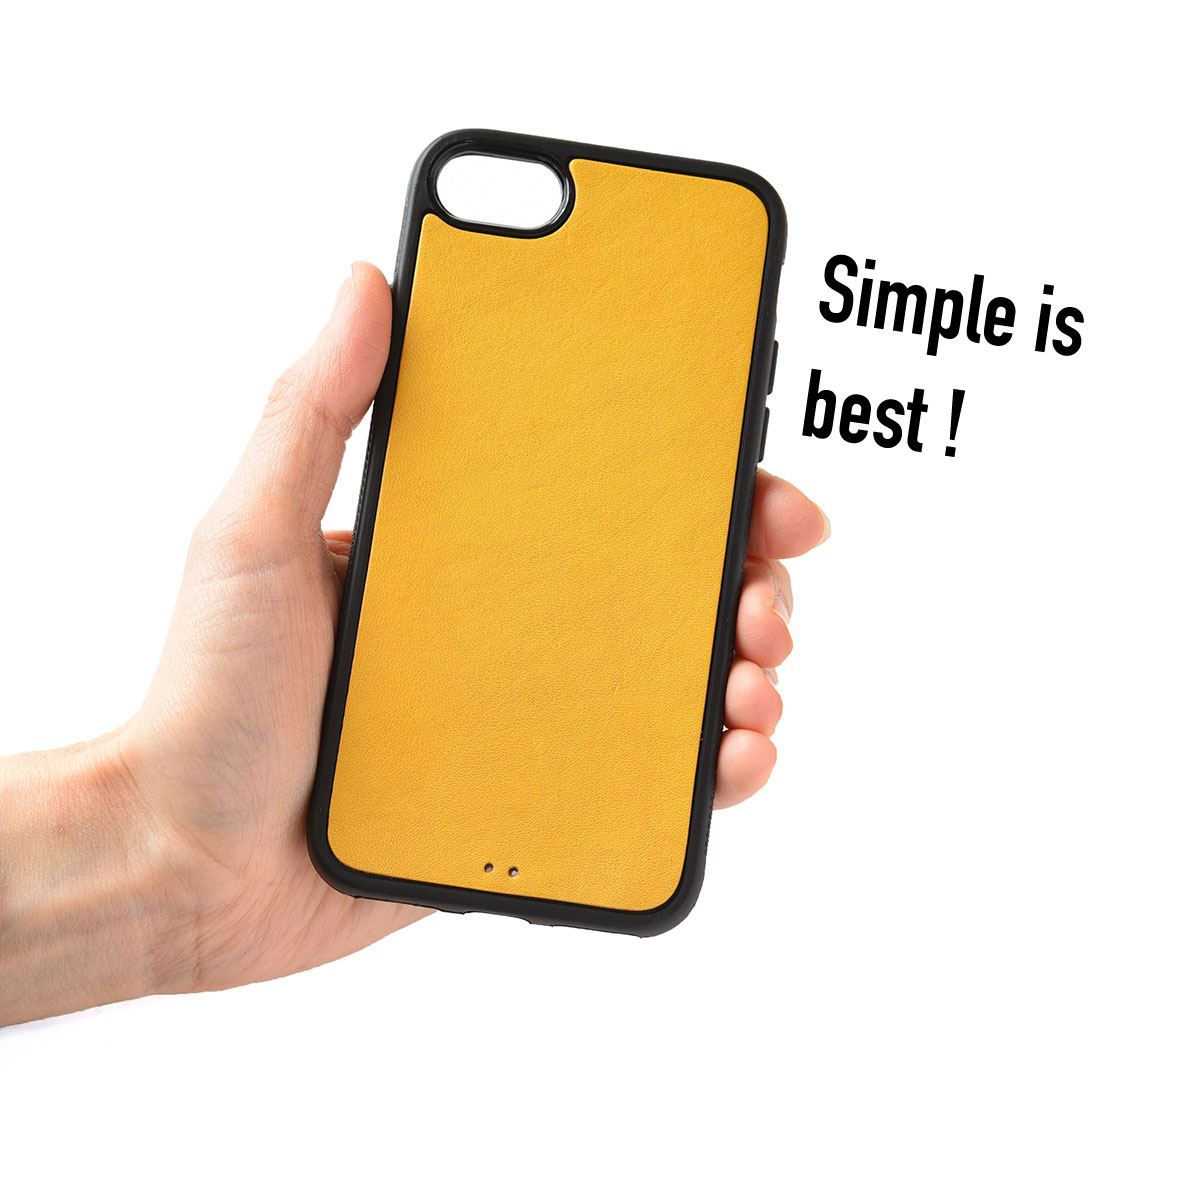 iPhoneOpenCase:   Design A:プレーン